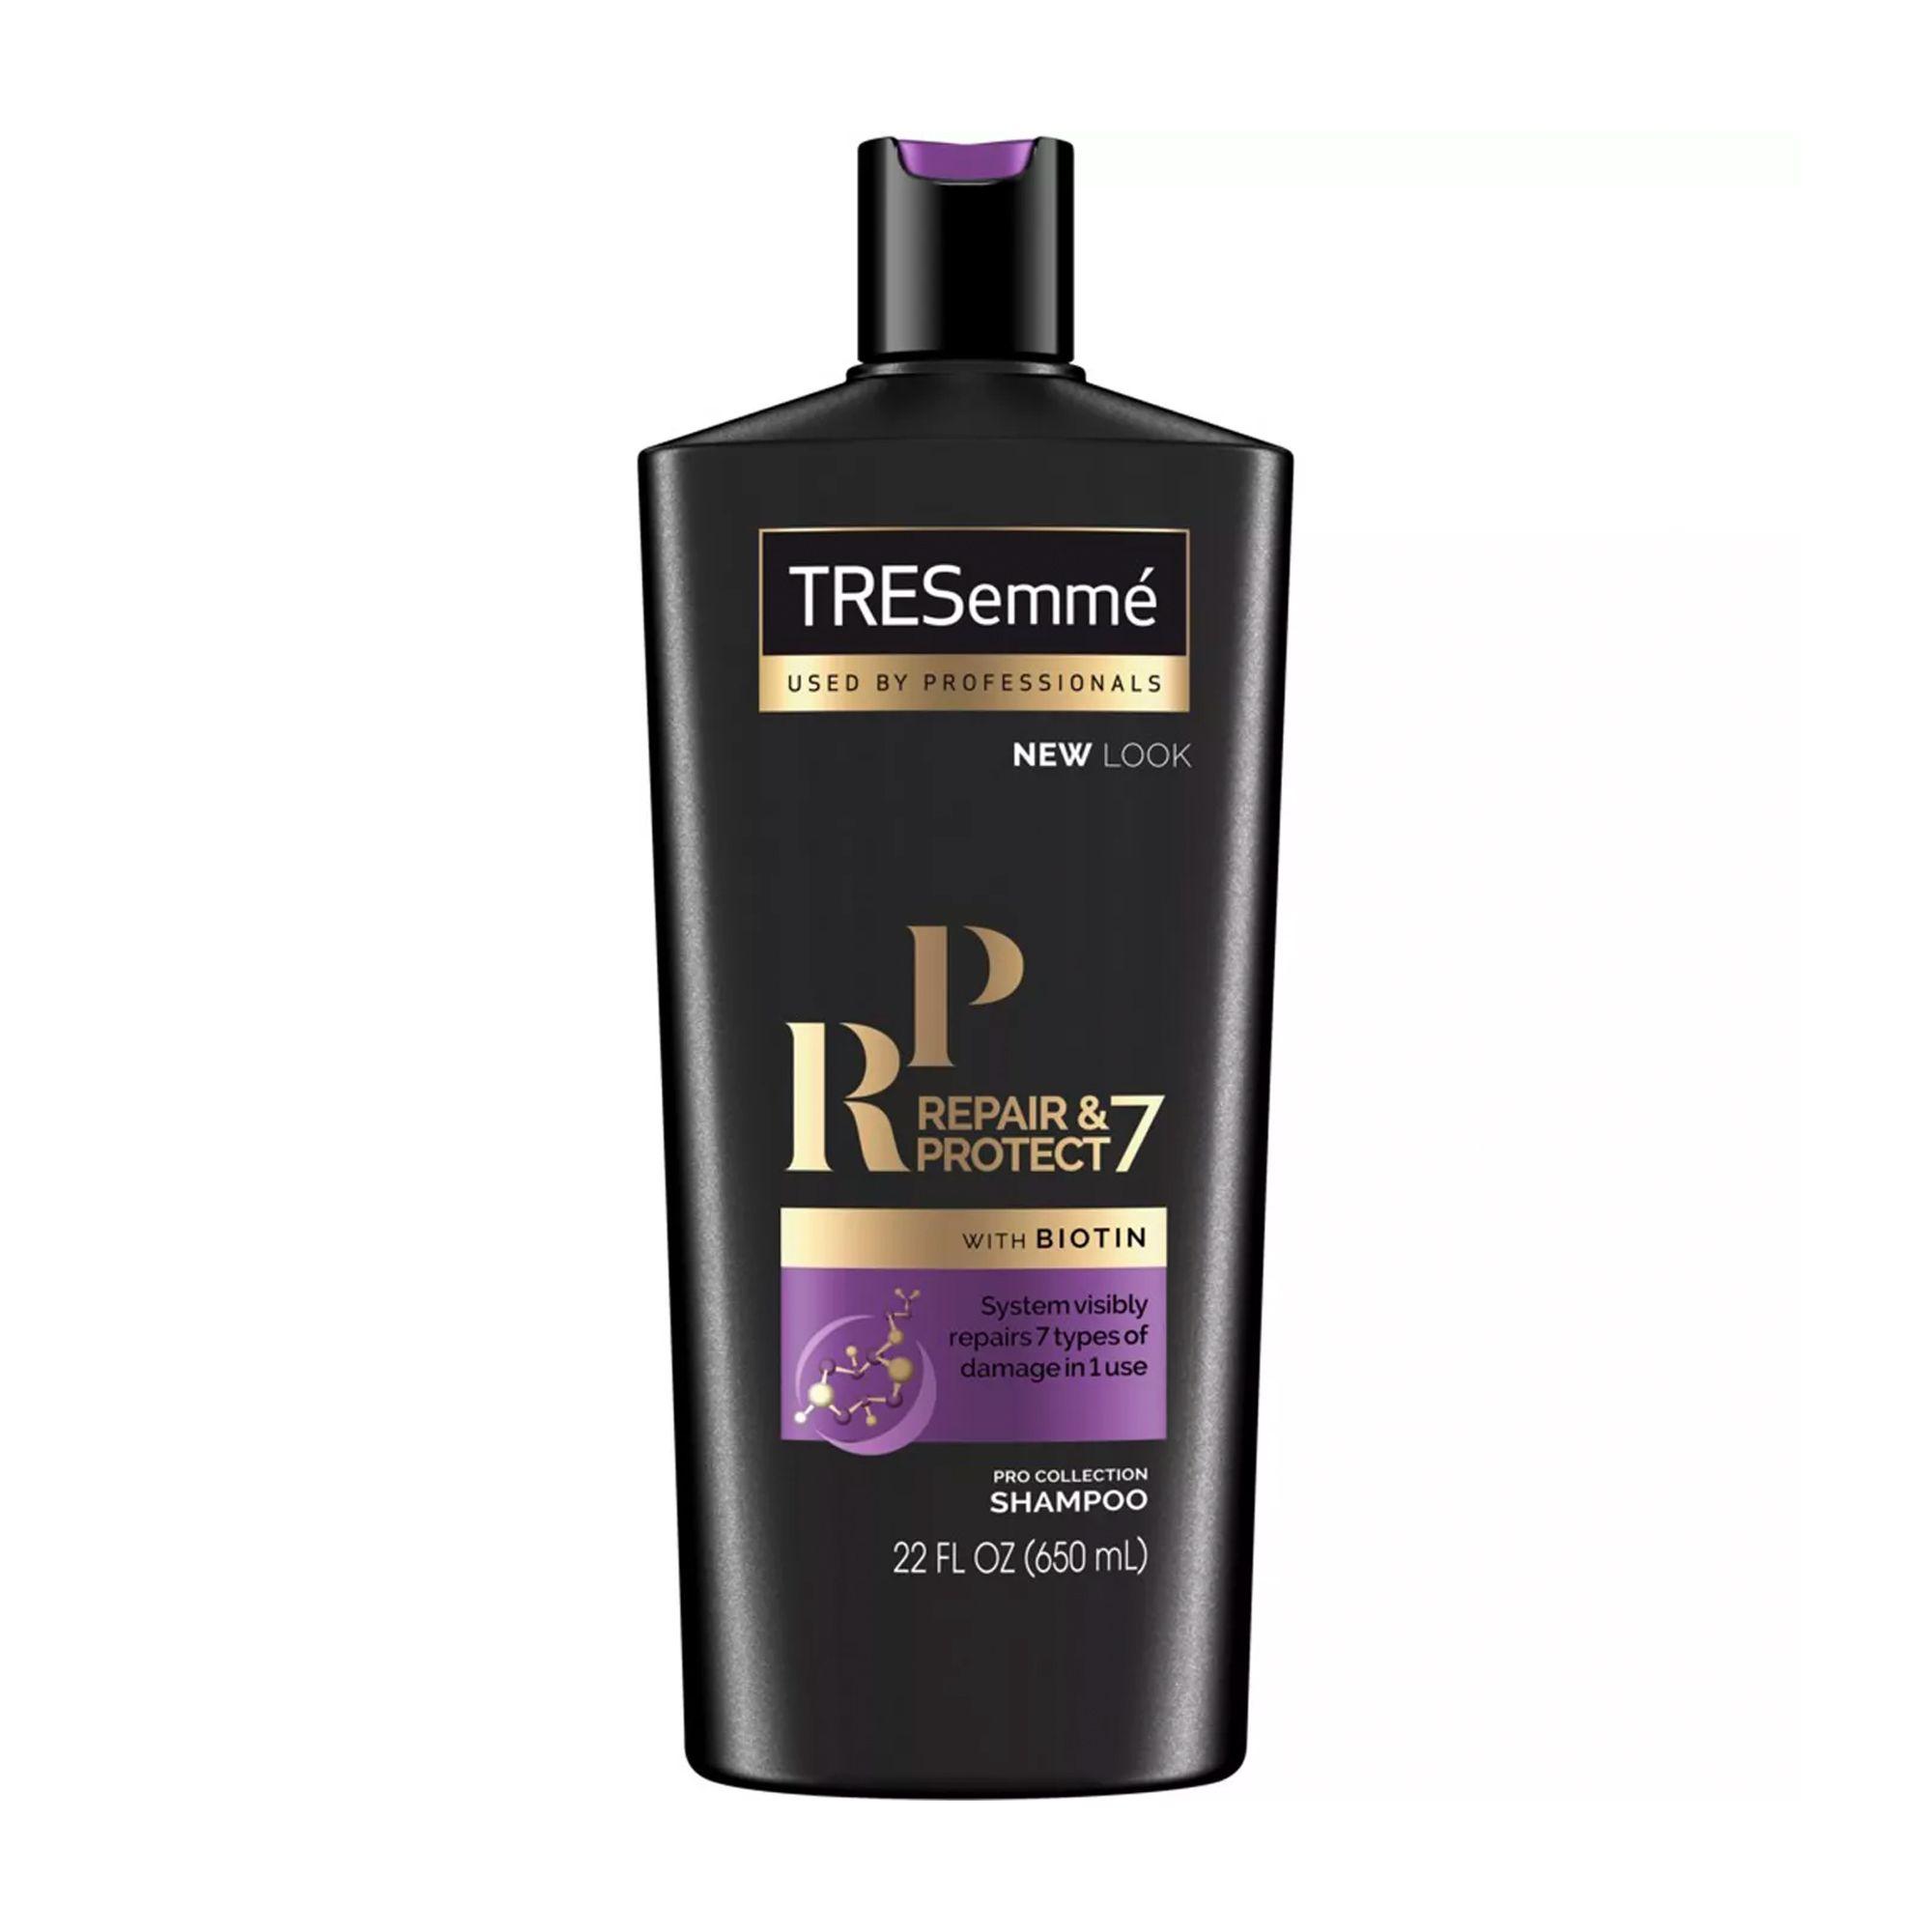 The Best Shampoo For Dry Hair Drugstore Shampoo Hair Shampoo Best Best Shampoos